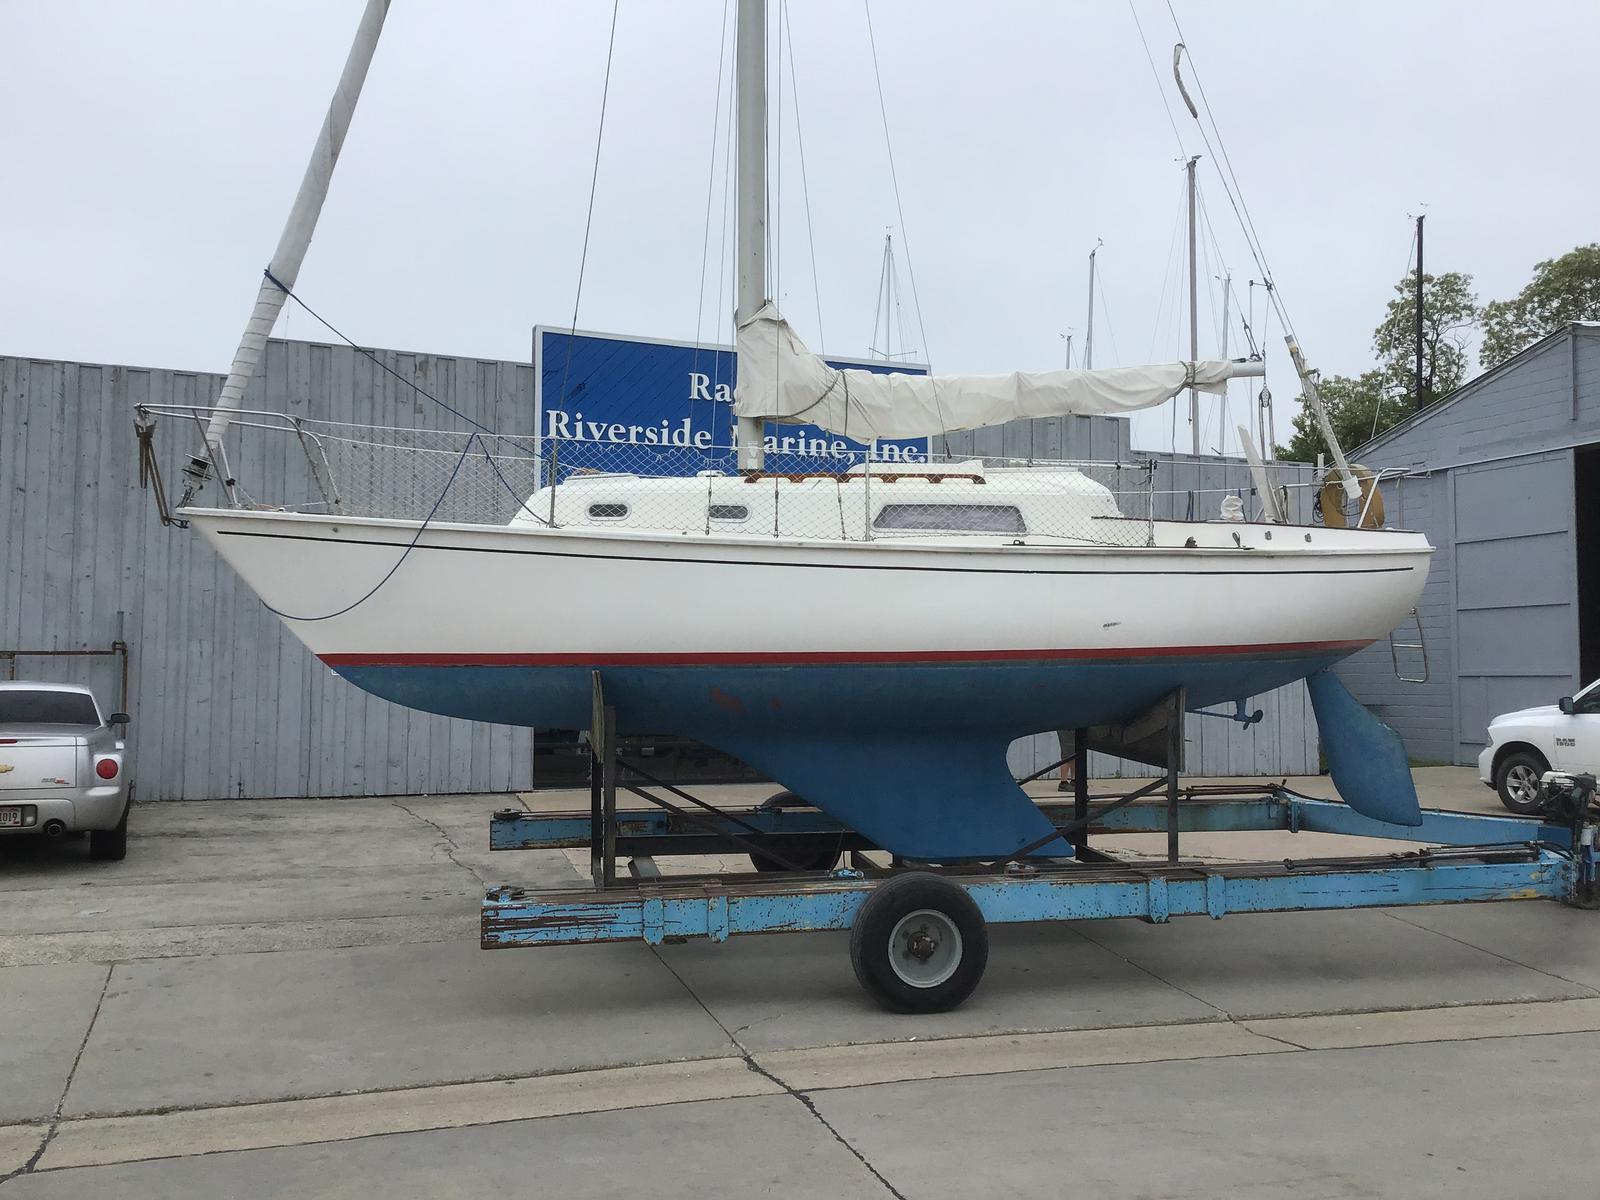 Inventory Racine Riverside Marine Racine, WI (262) 636-8020